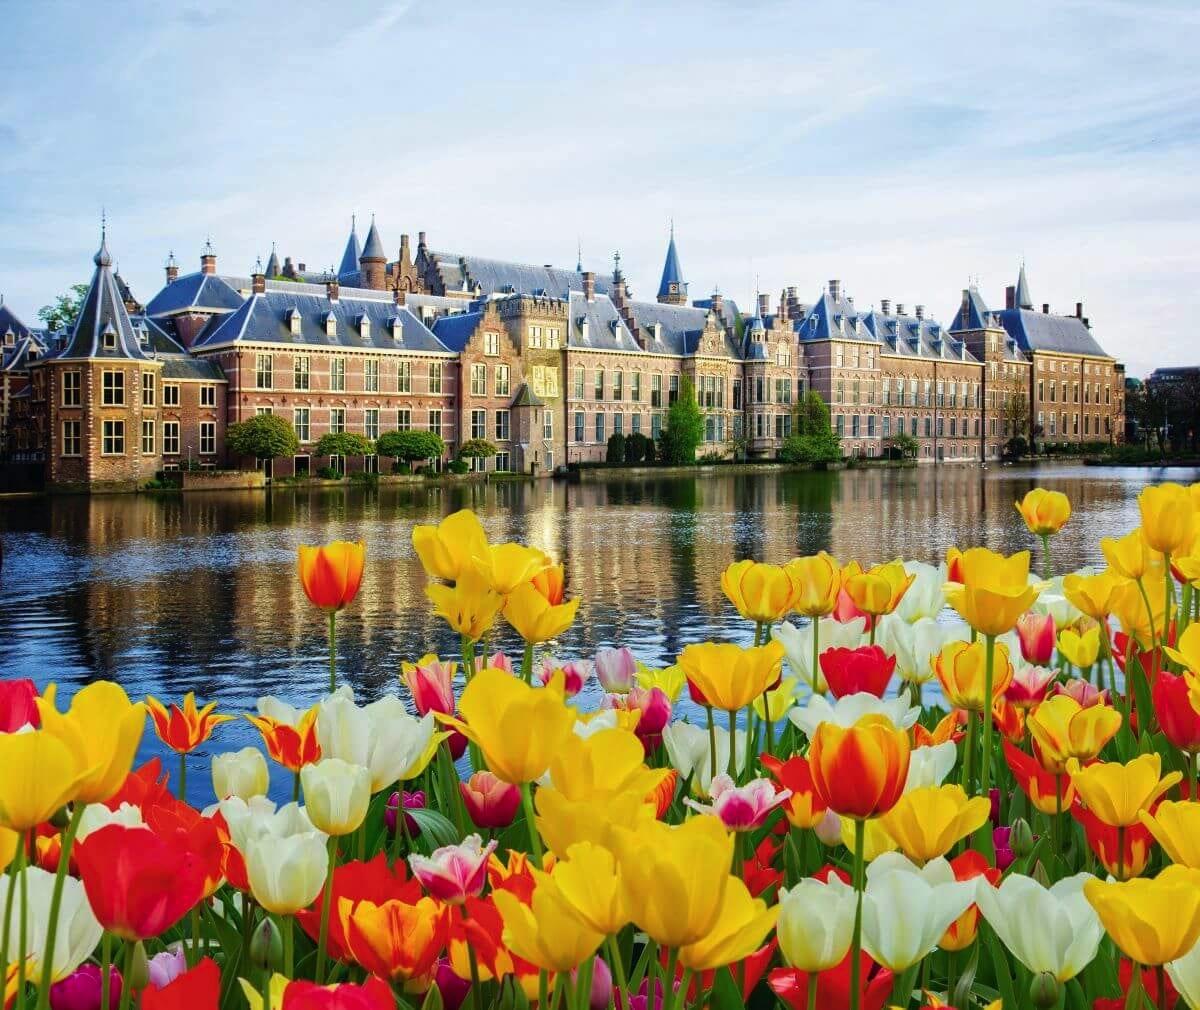 Tulpenblüte de Luxe